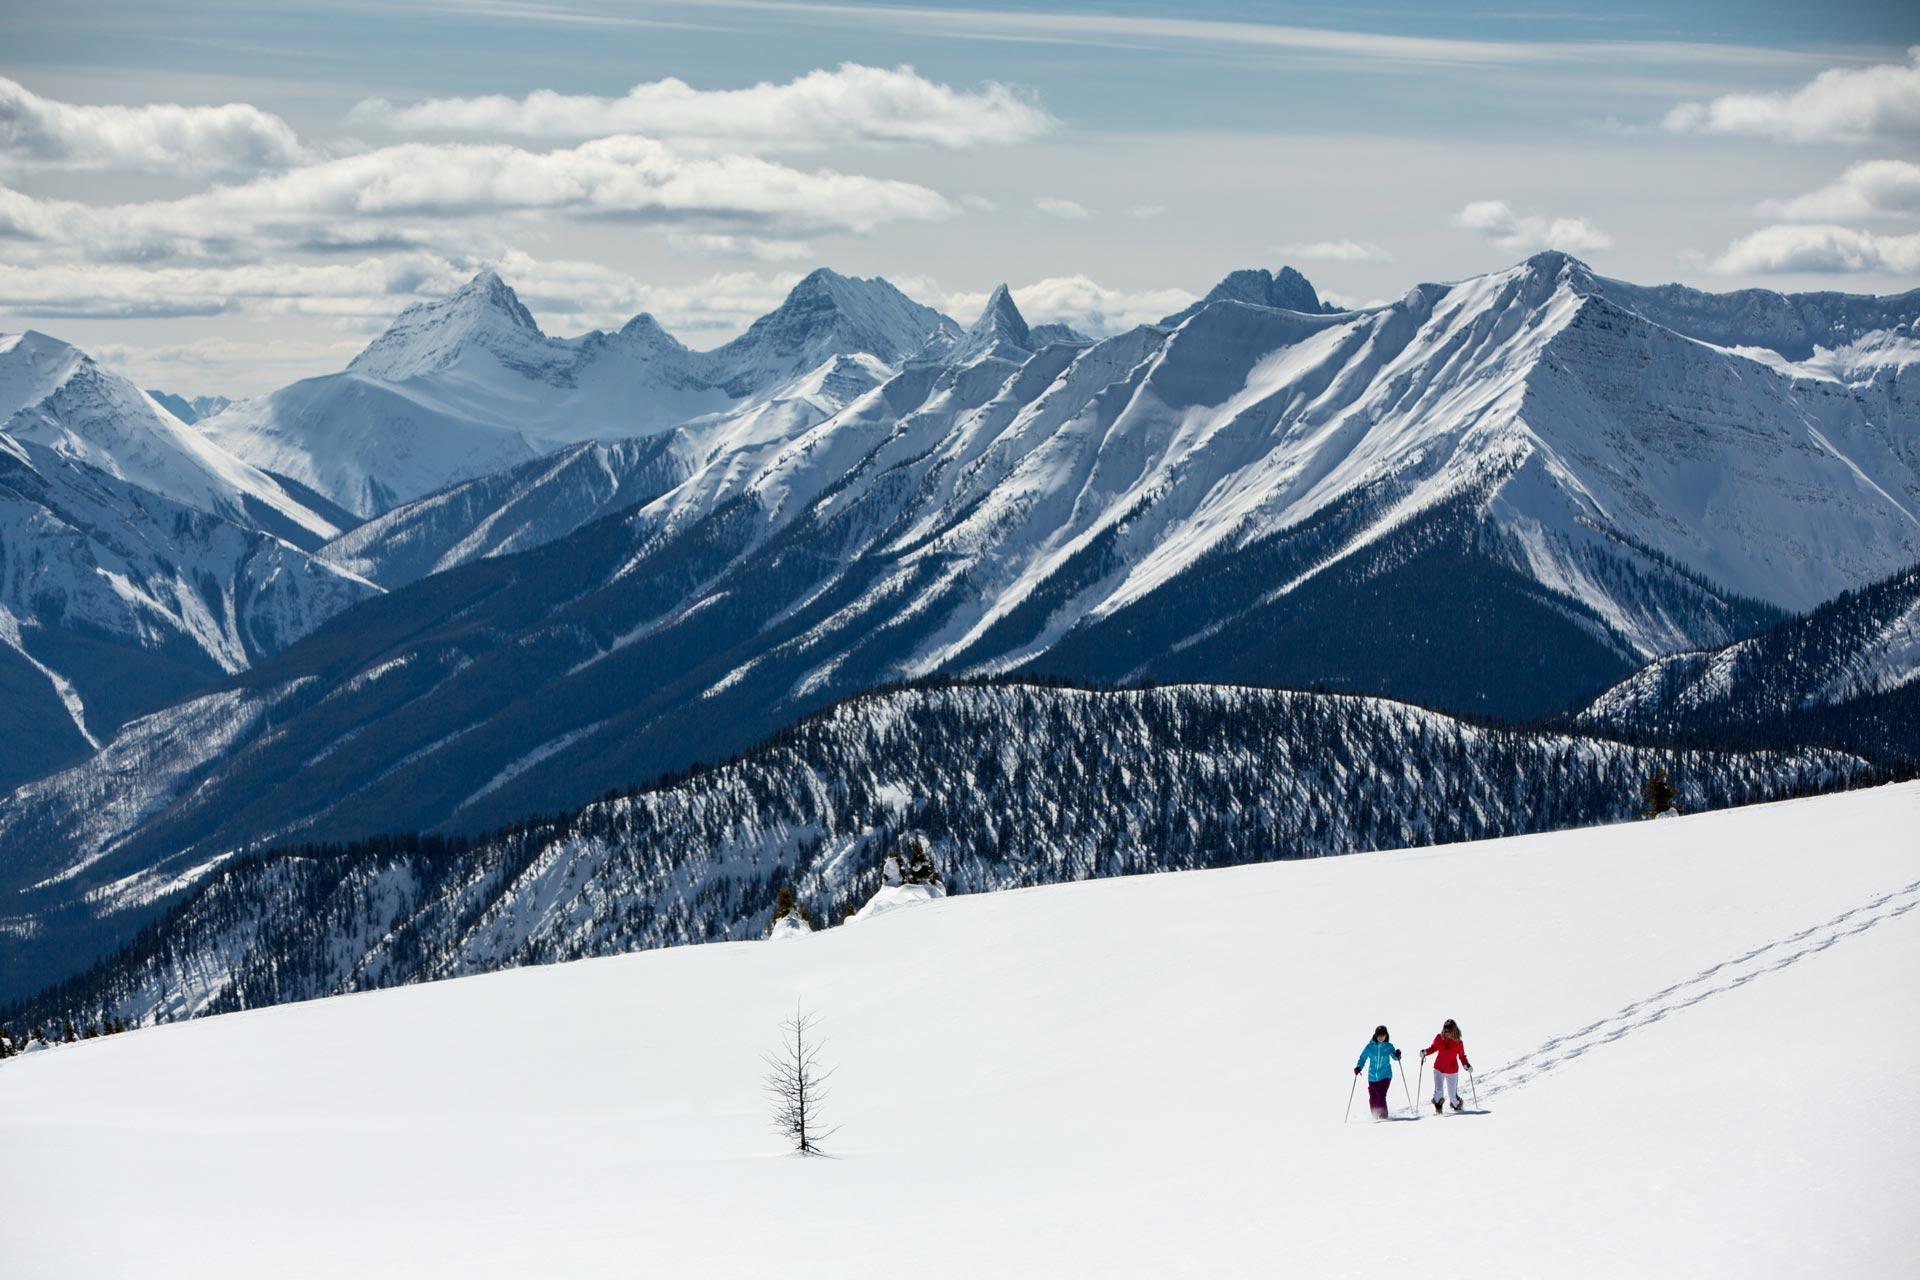 Snowshoeing at Banff's Sunshine Meadows. Photo by Paul Zizka.